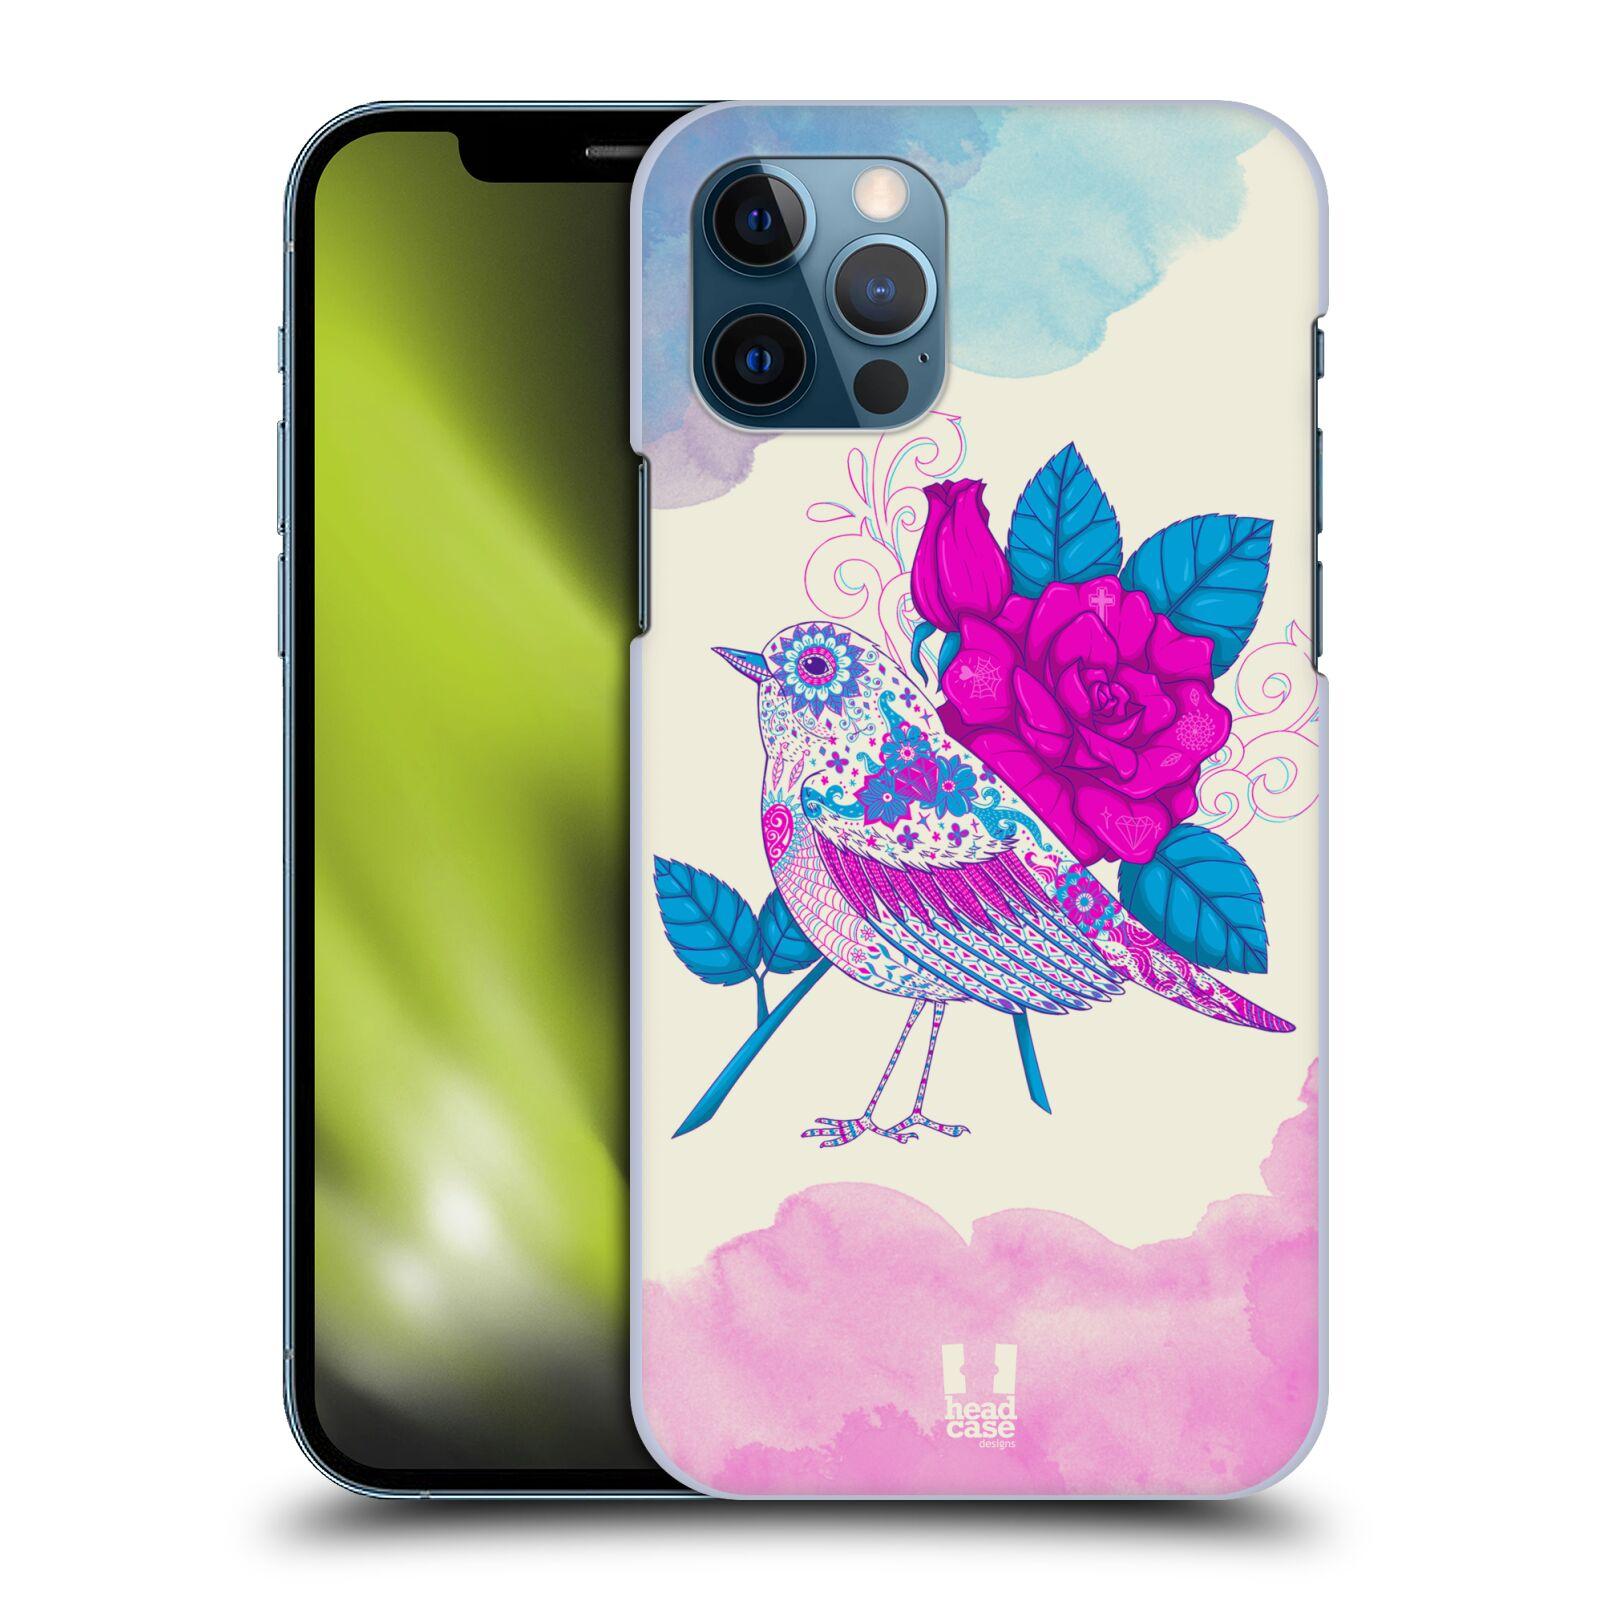 Plastové pouzdro na mobil Apple iPhone 12 / 12 Pro - Head Case - PTÁČEK FUCHSIA